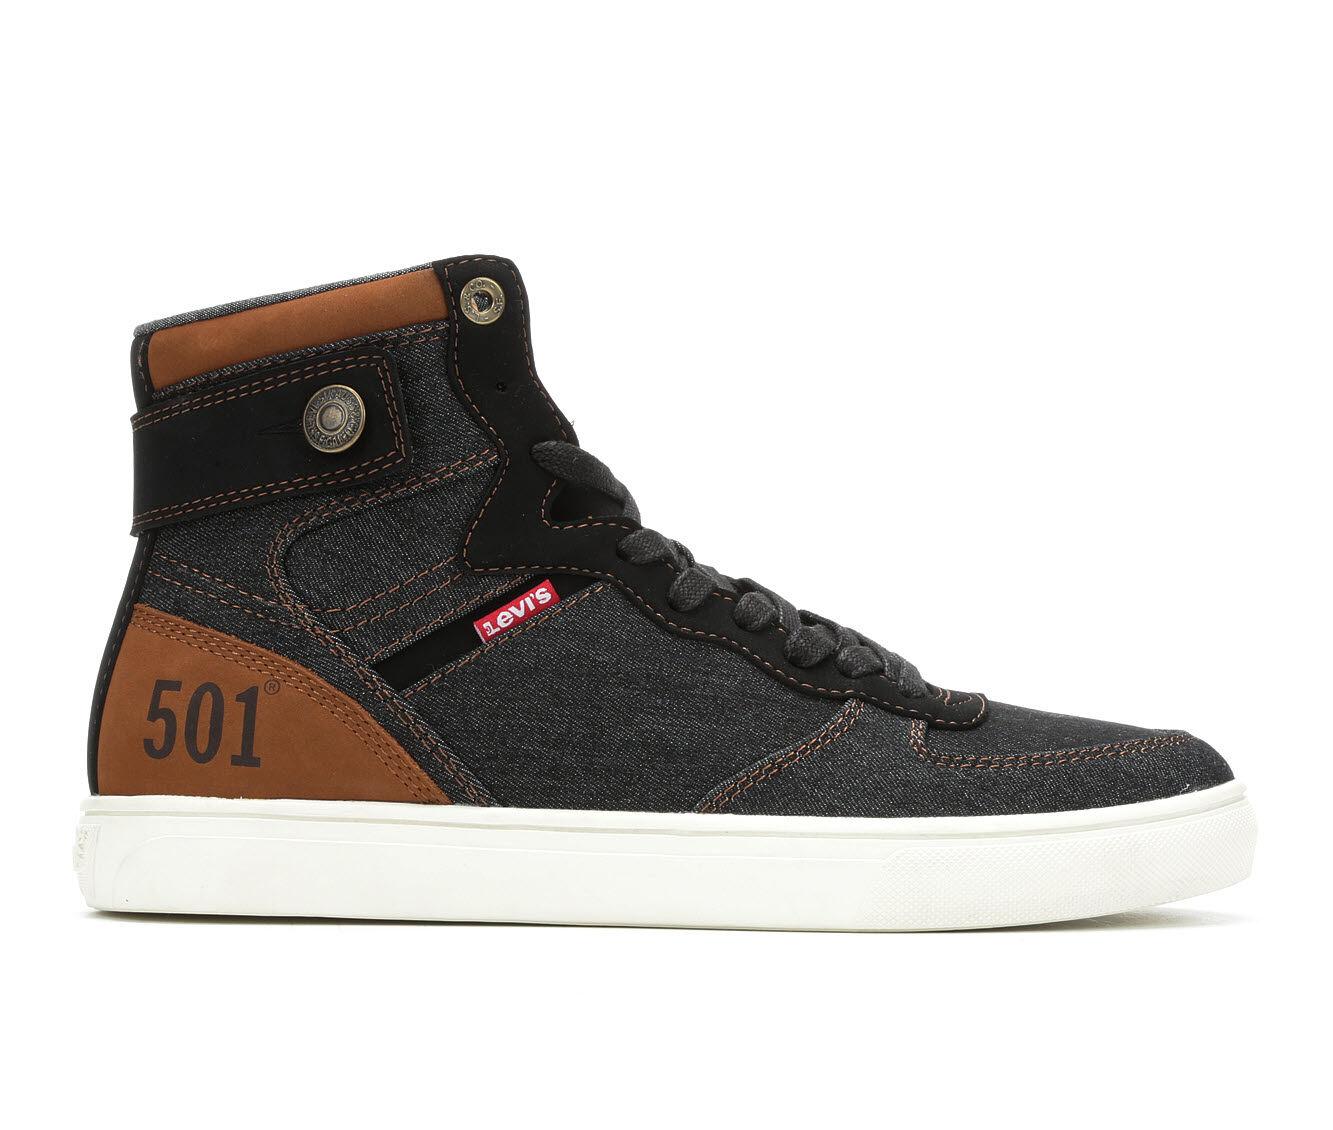 Men's Levis Jeffery Hi 501 Denim Casual Shoes Black/Tan